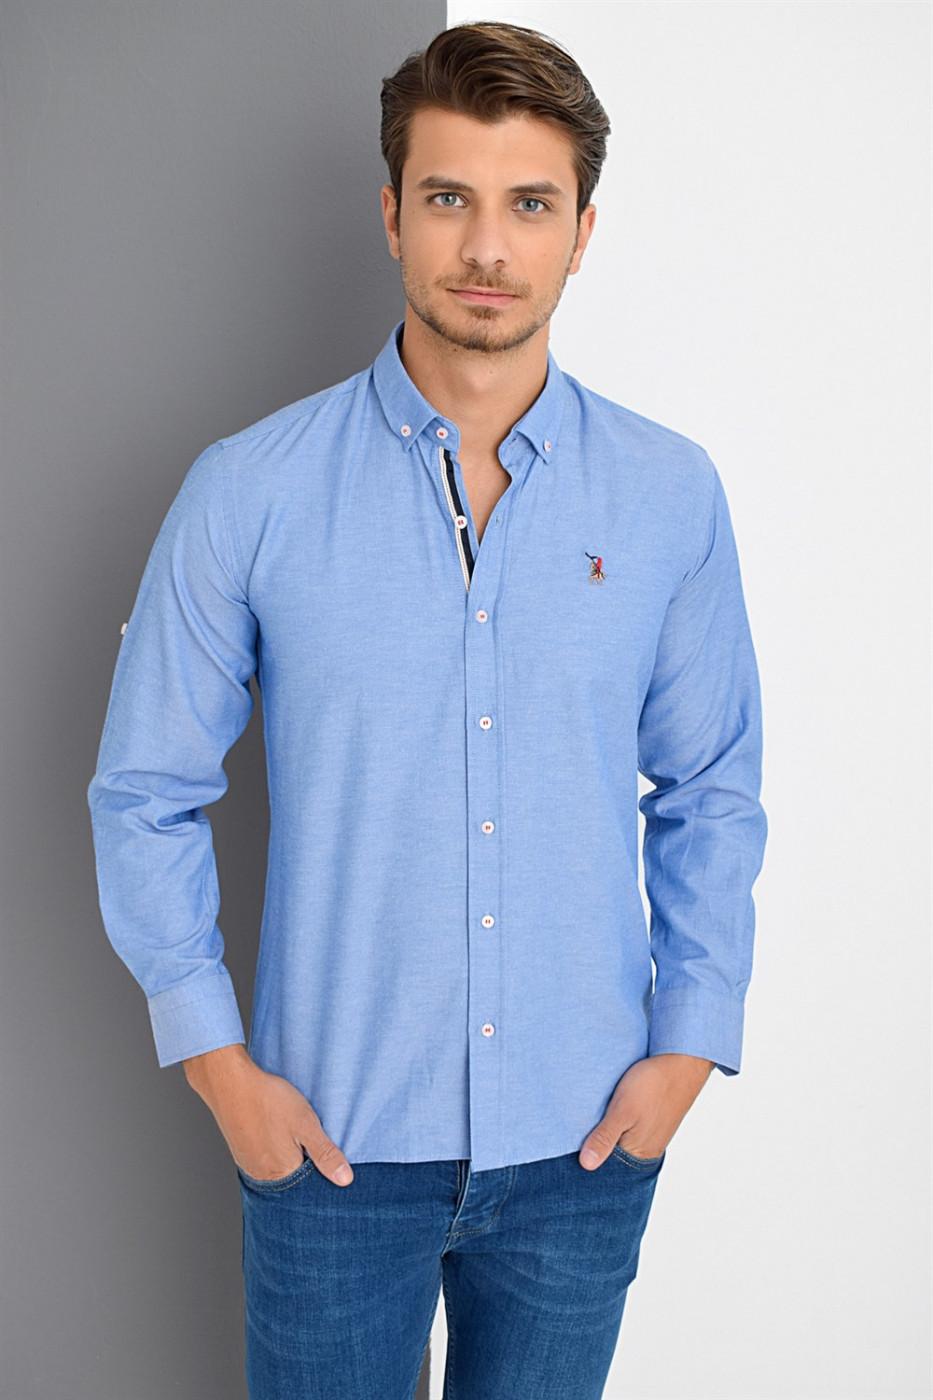 G674 Dewberry Men's Shirt-saks